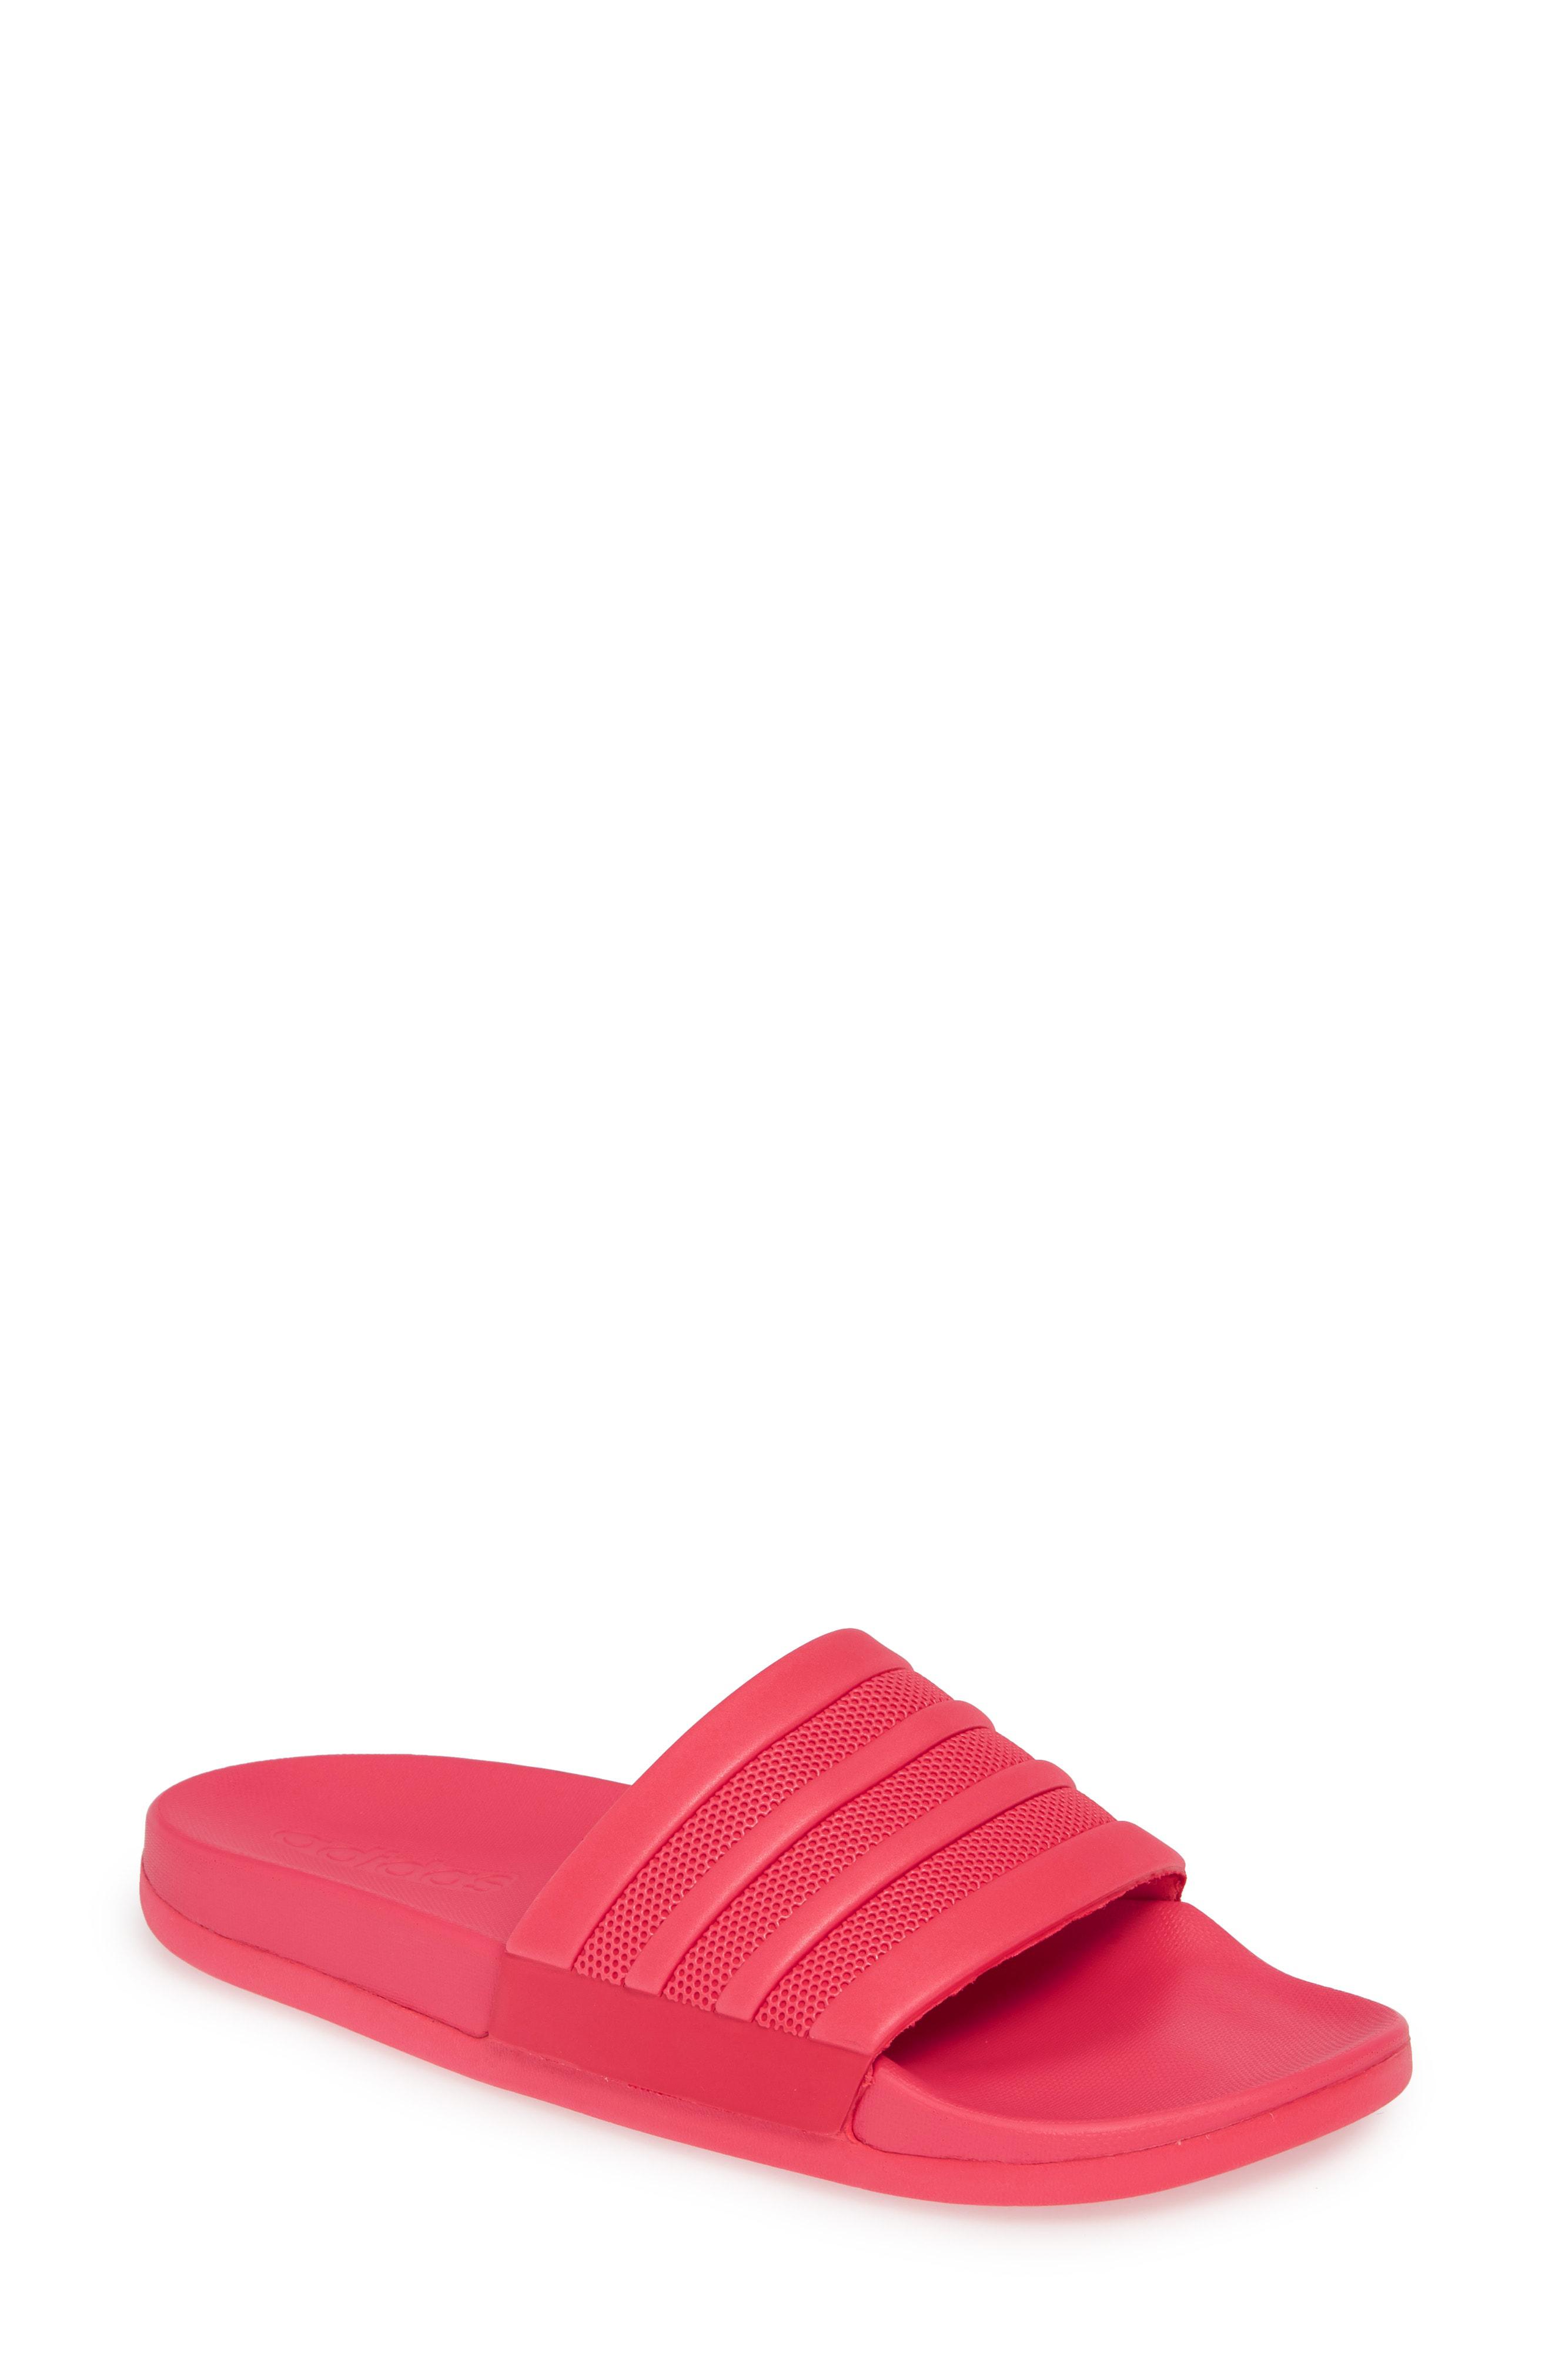 2a077ddd20da Adidas Originals Adilette Rubber Comfort Slide Sandals In Active Pink   Active Pink